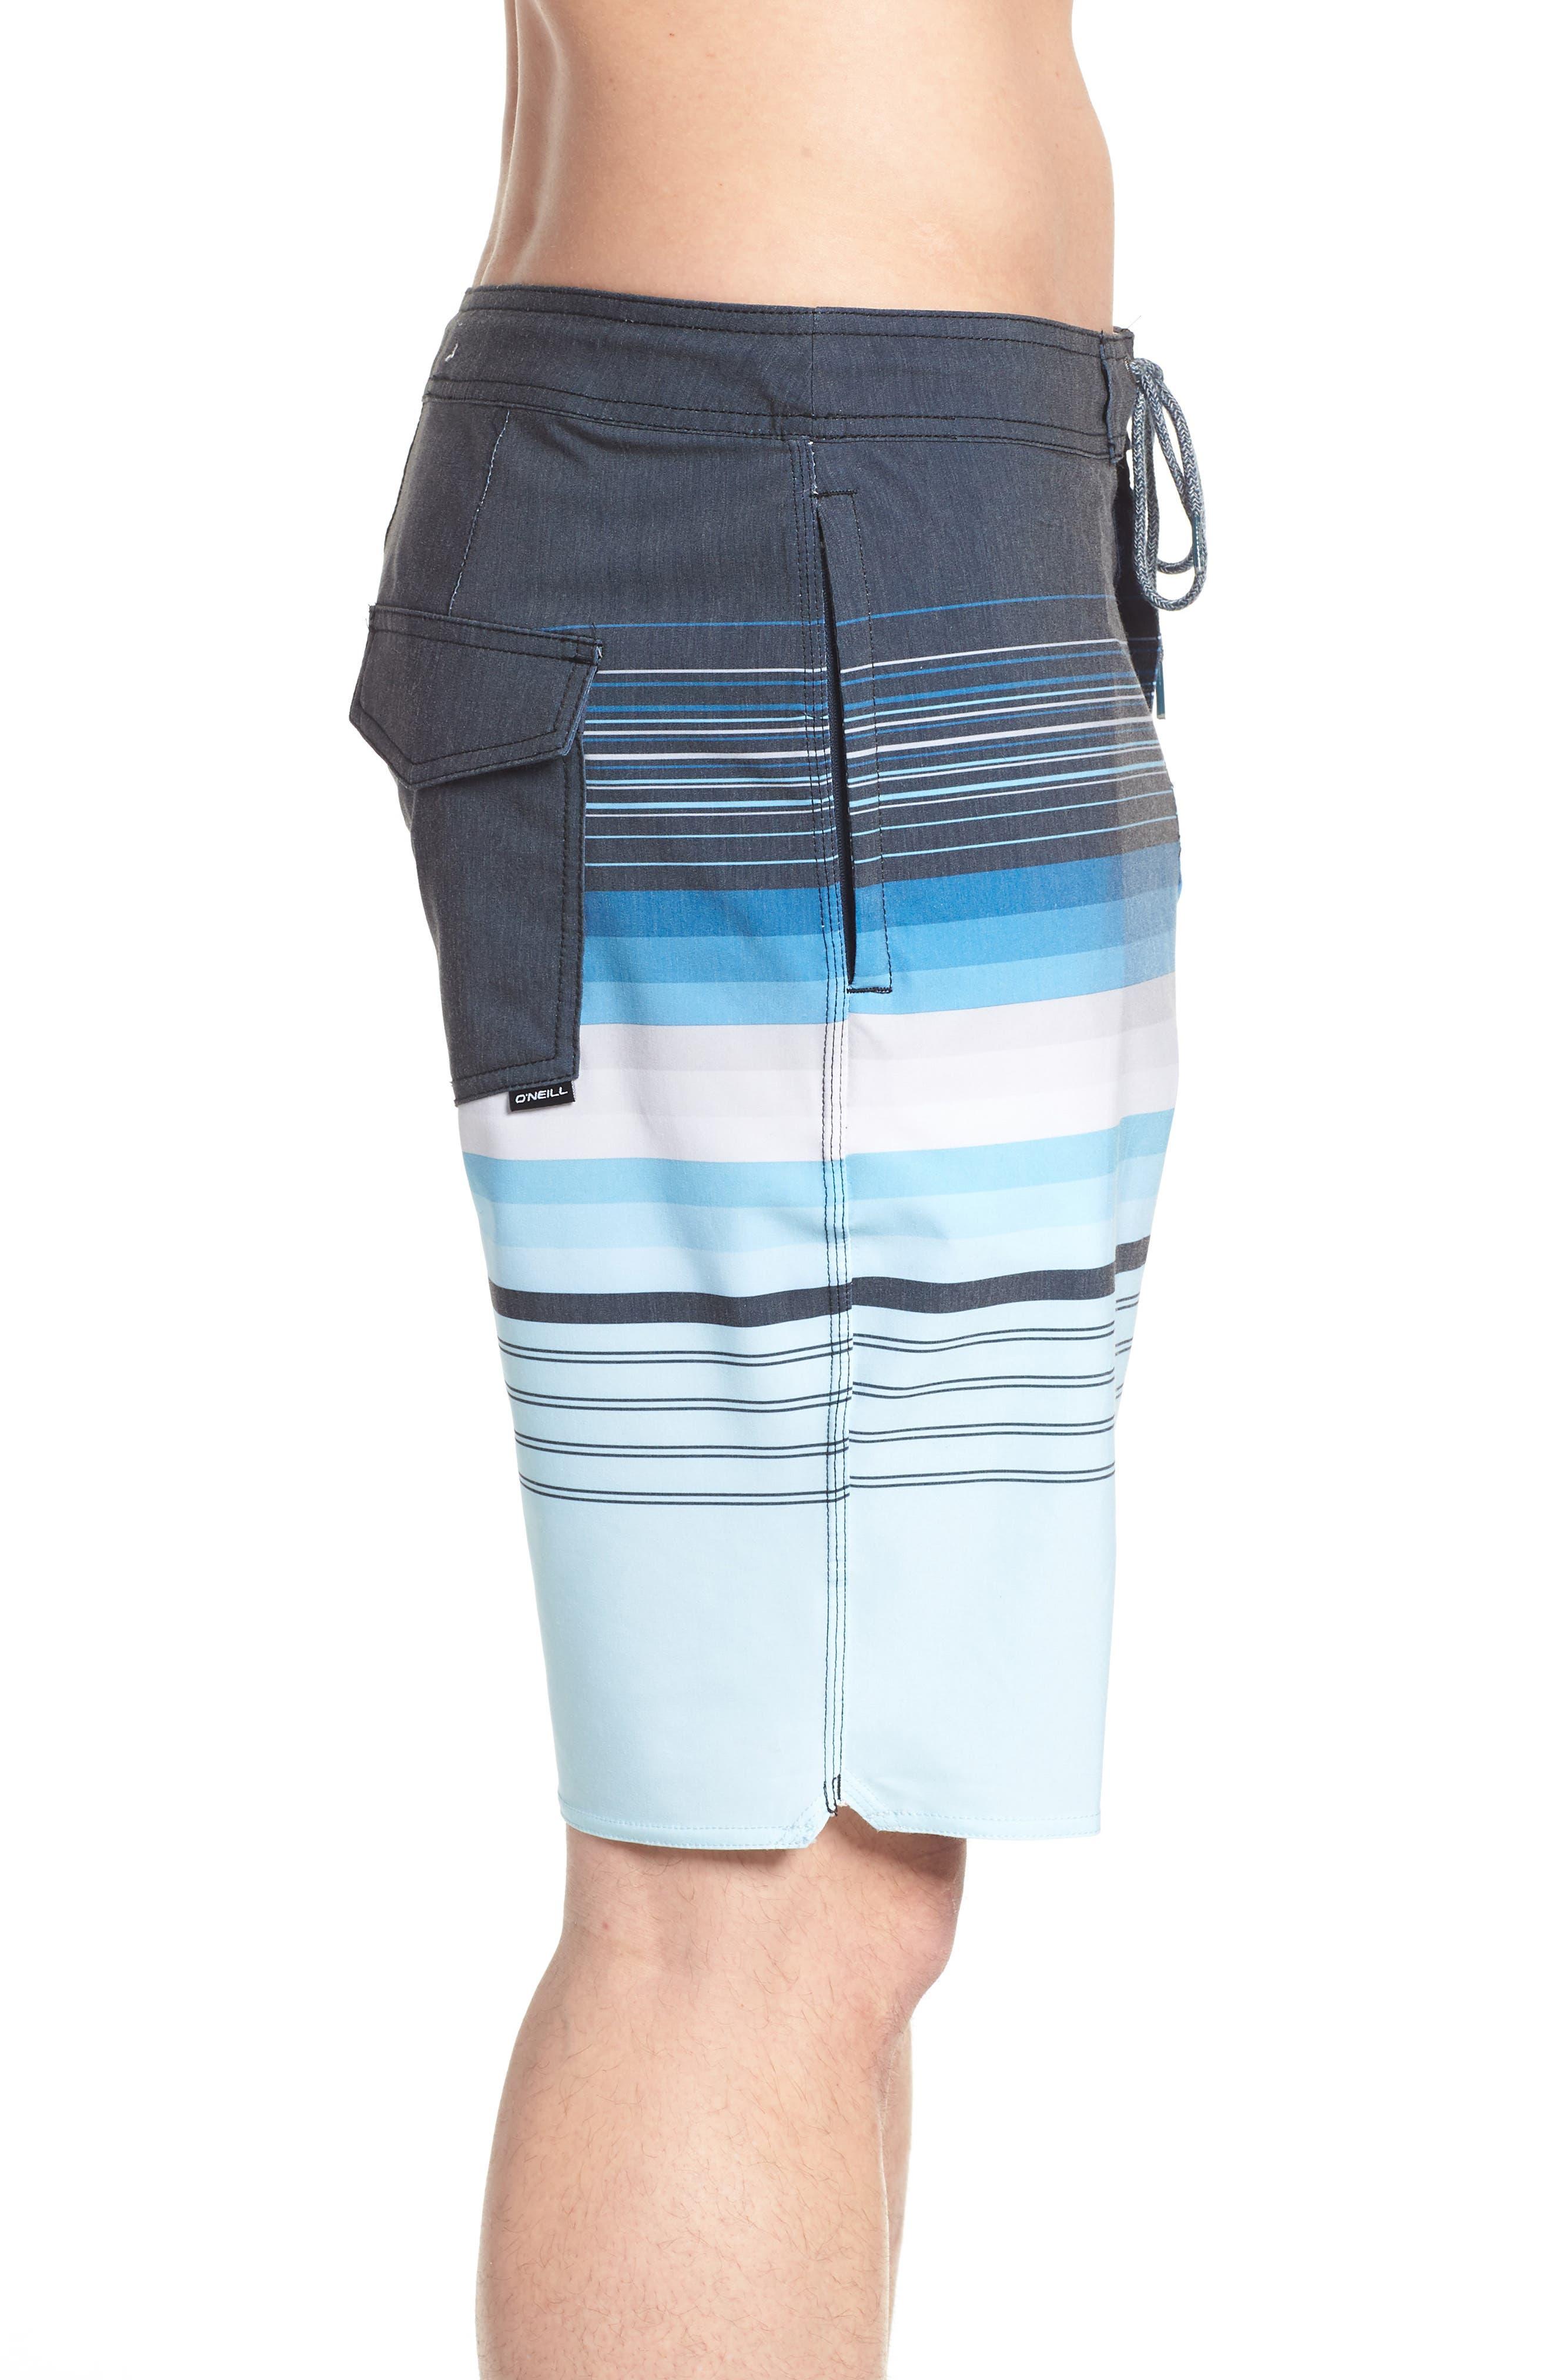 Sandbar Cruzer Board Shorts,                             Alternate thumbnail 3, color,                             NAVY